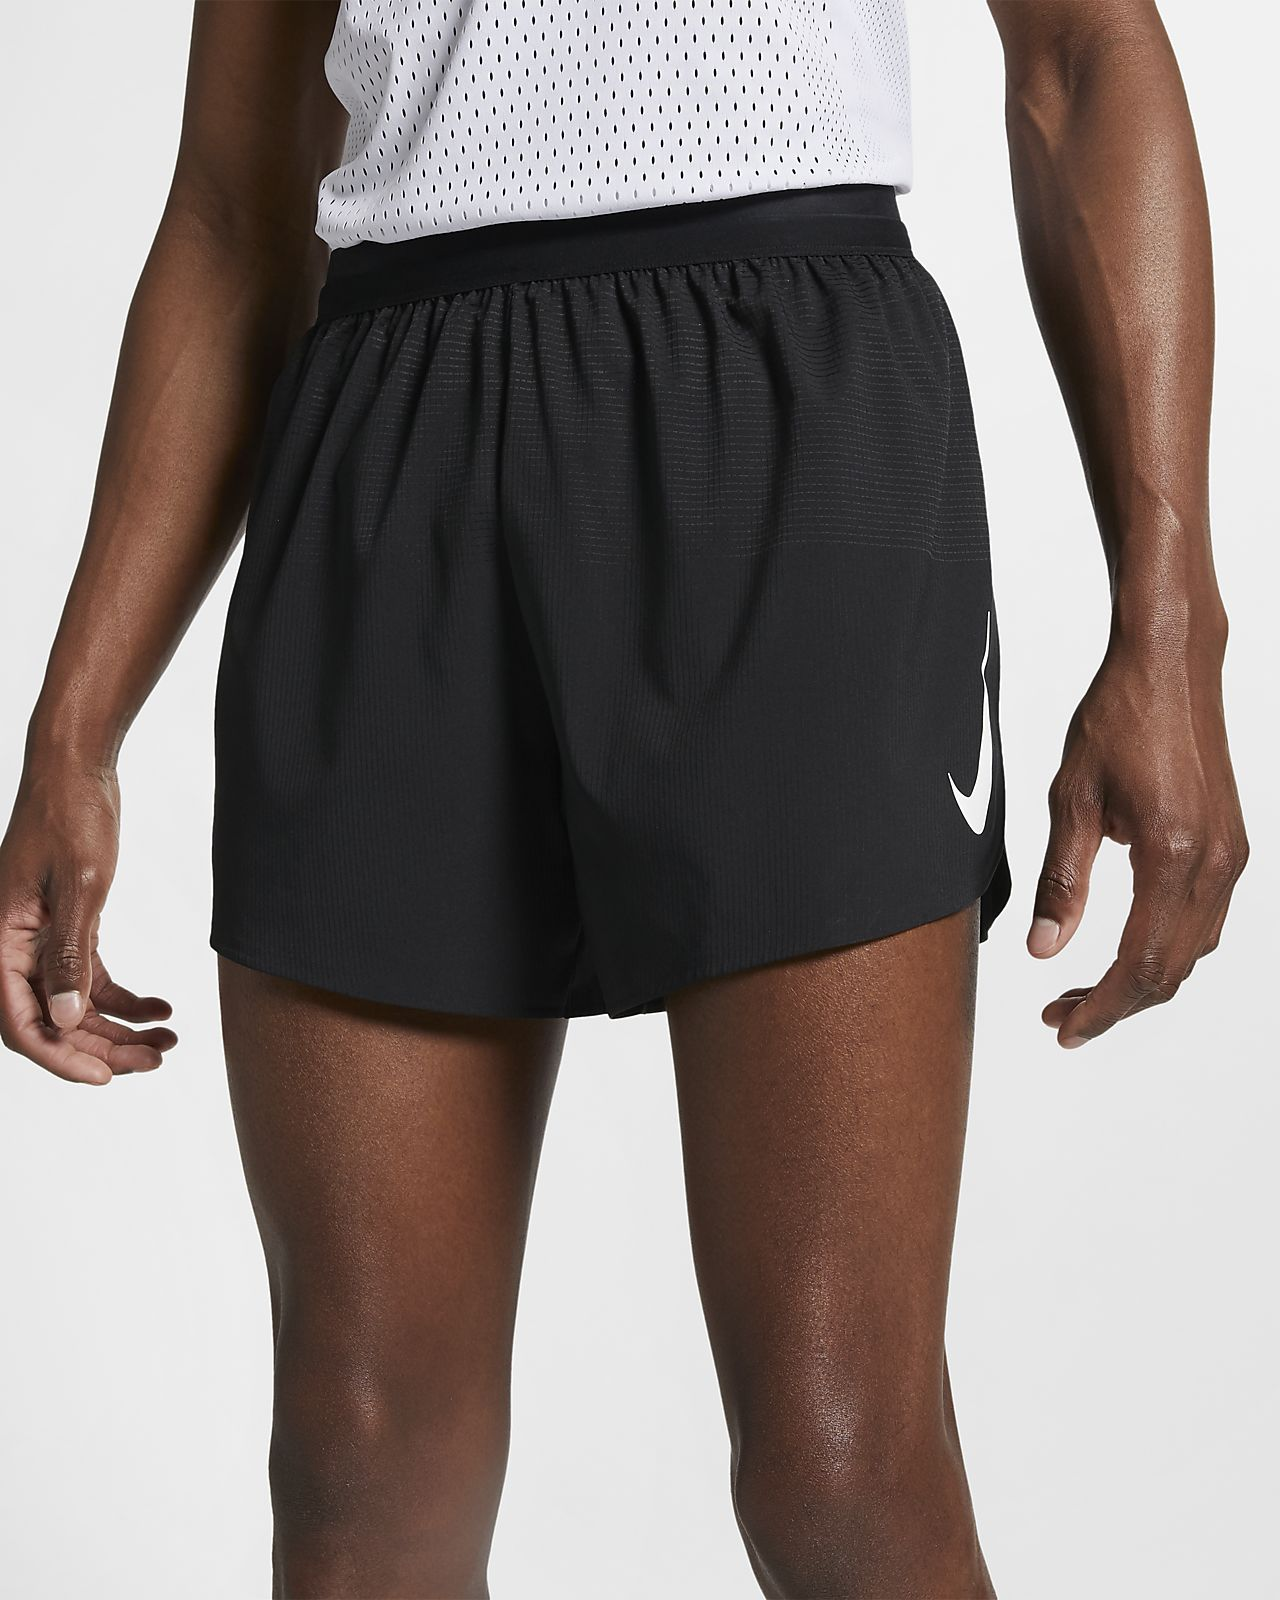 Nike AeroSwift (London) 10cm (approx.) Running Shorts